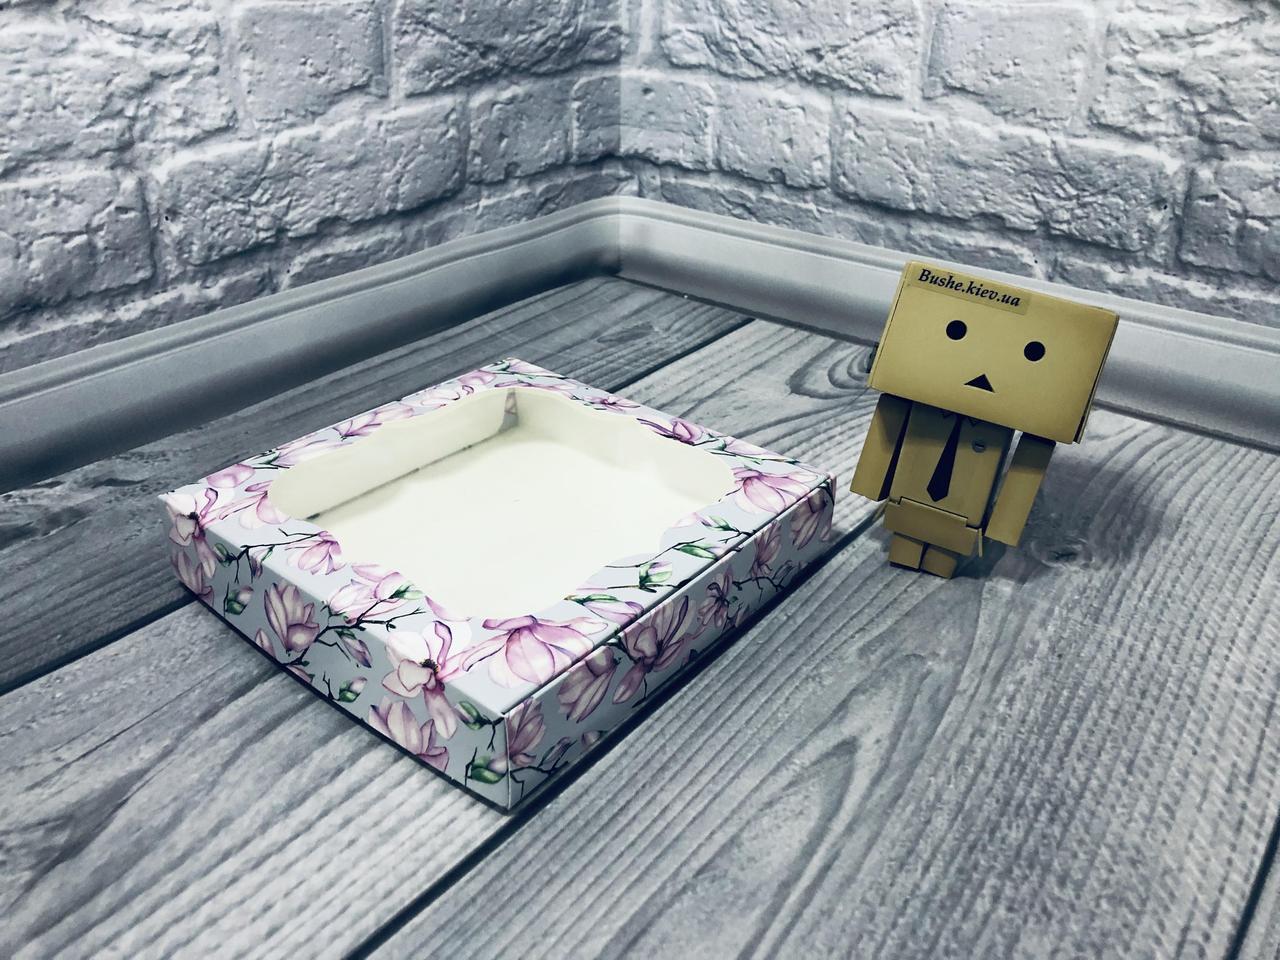 *10 шт* / Коробка для пряников / 150х150х30 мм / печать-Магнол / окно-обычн / лк / цв